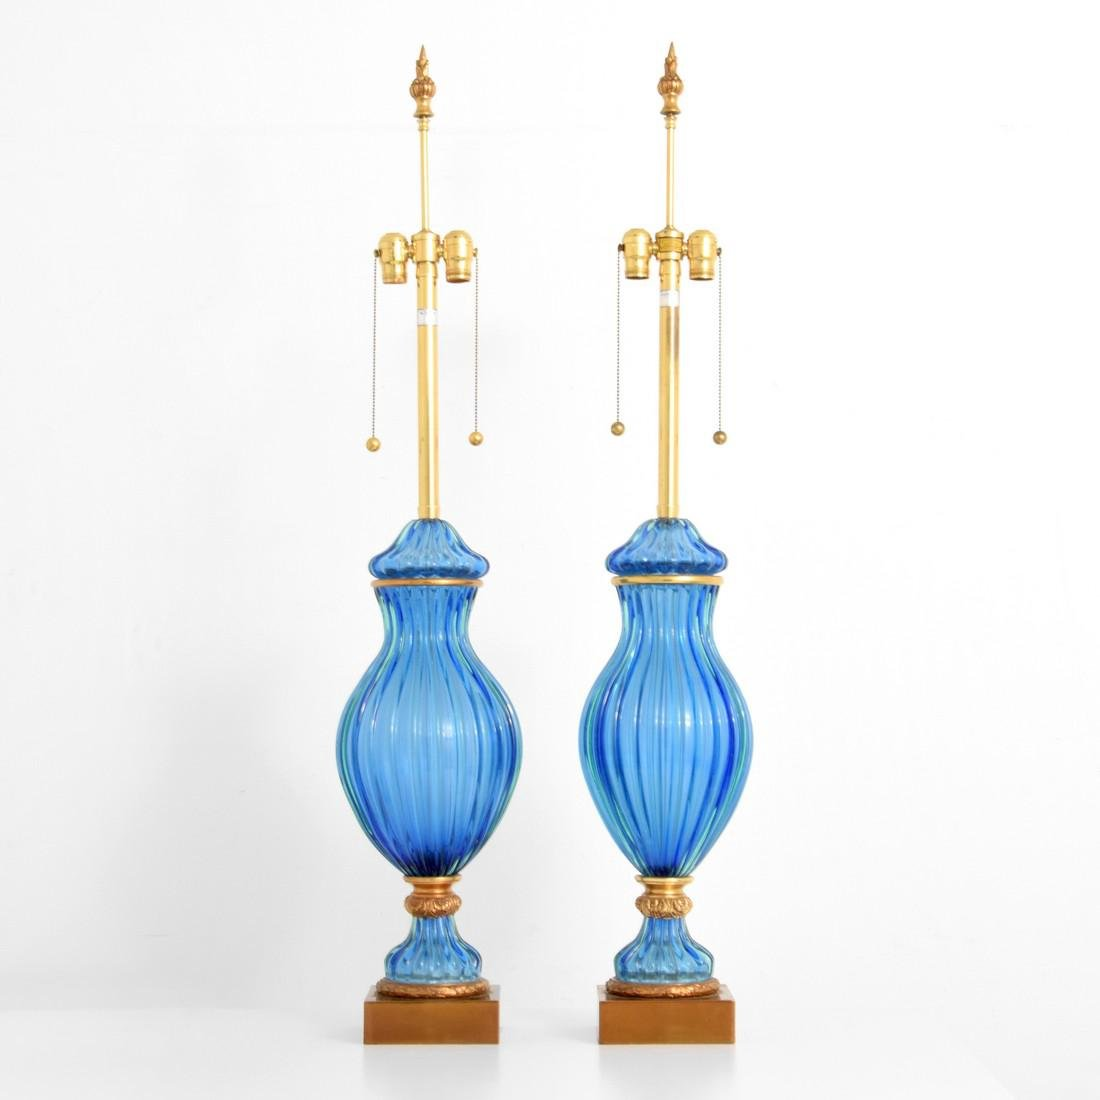 Pair of Monumental Marbro Lamp Co. Lamps